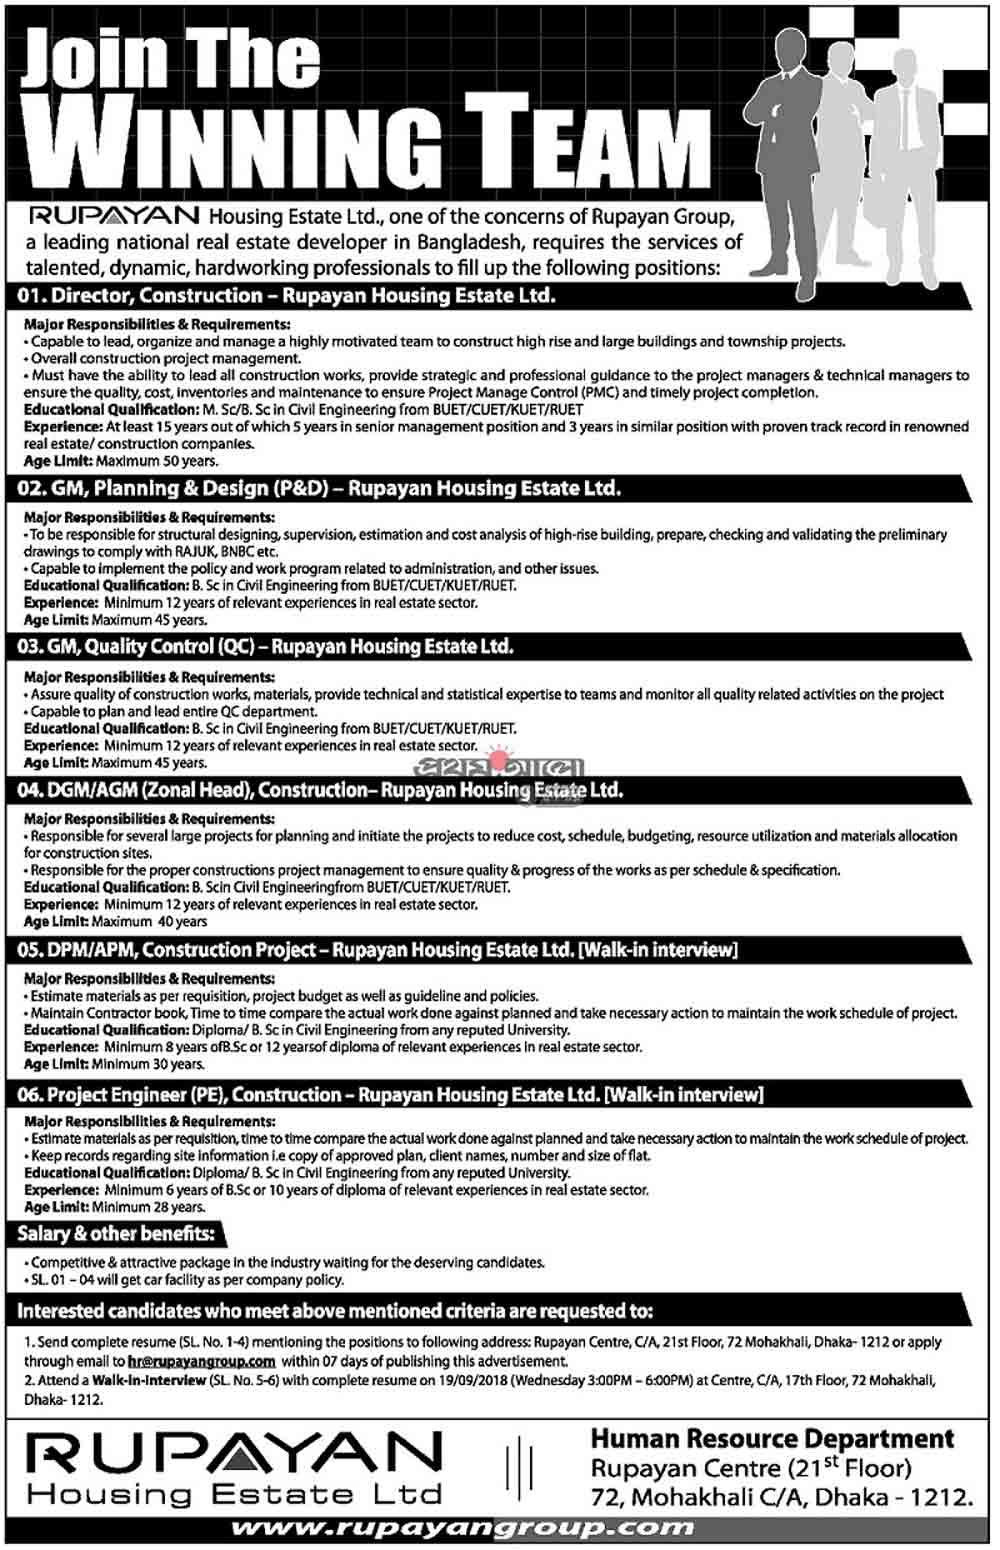 Rupayan Housing Estate Ltd Jobs Circular 2018